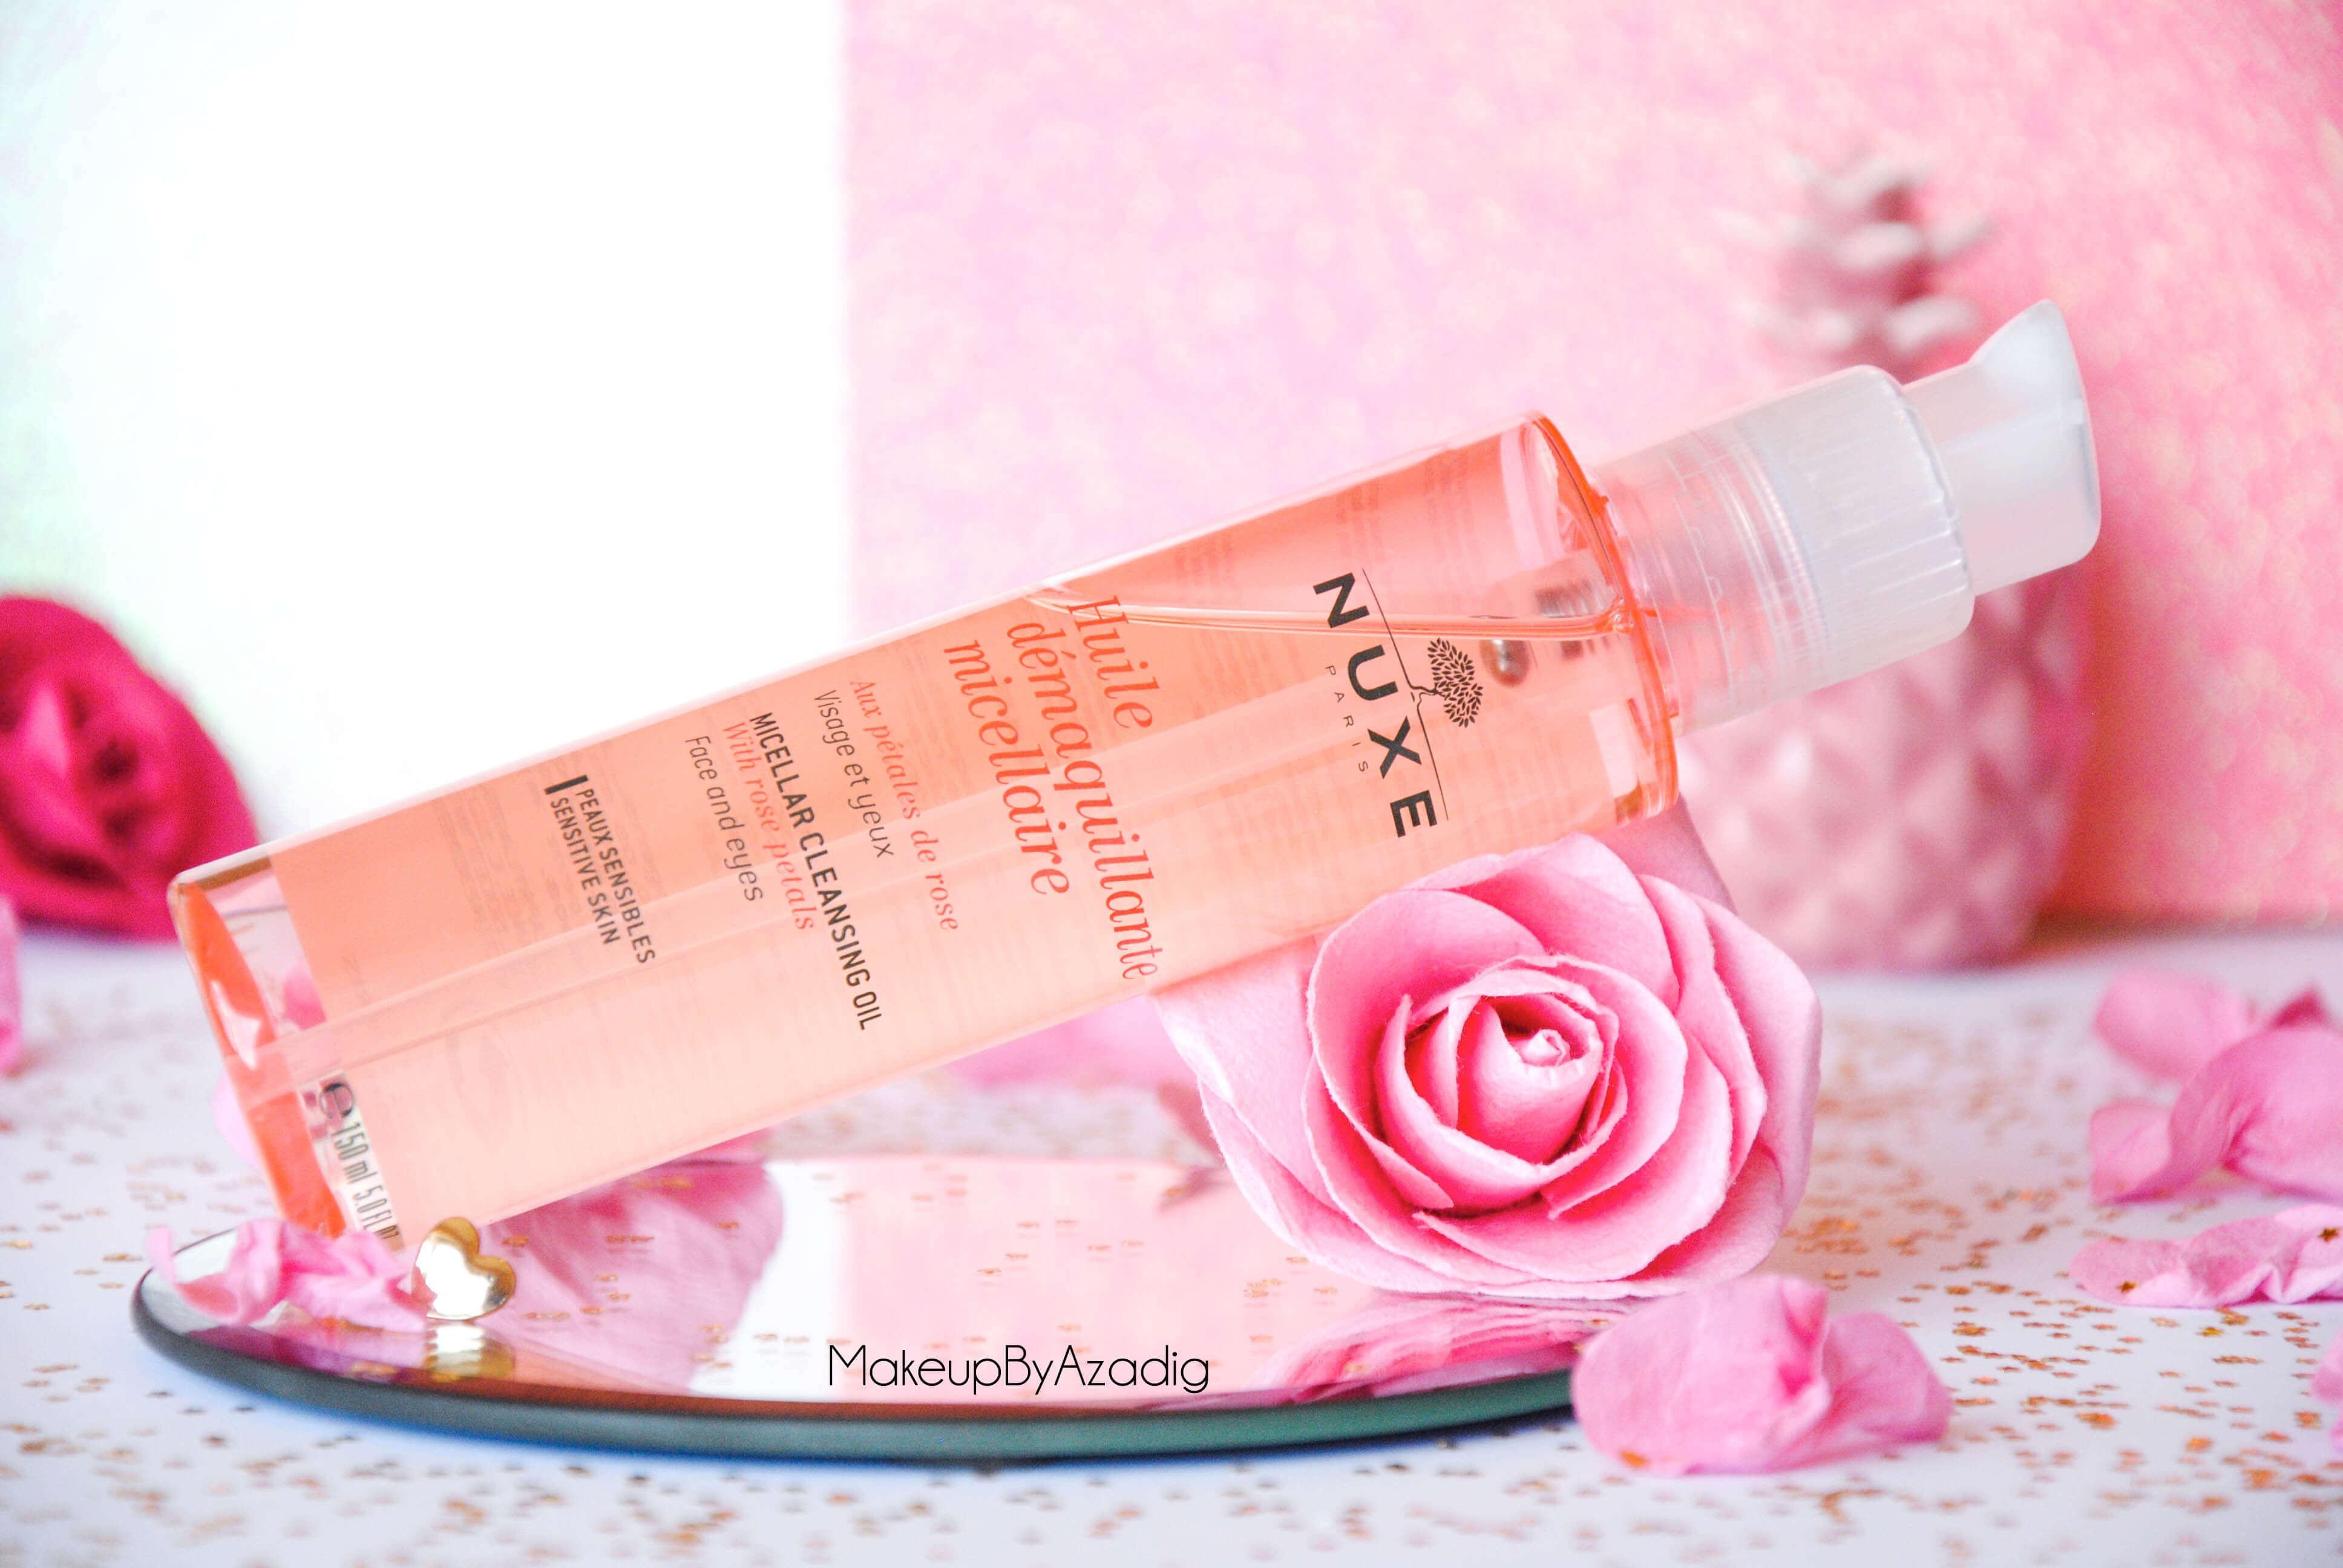 makeupbyazadig-huile-demaquillante-micellaire-nuxe-petales-de-rose-doctipharma-revue-avis-prix-paris